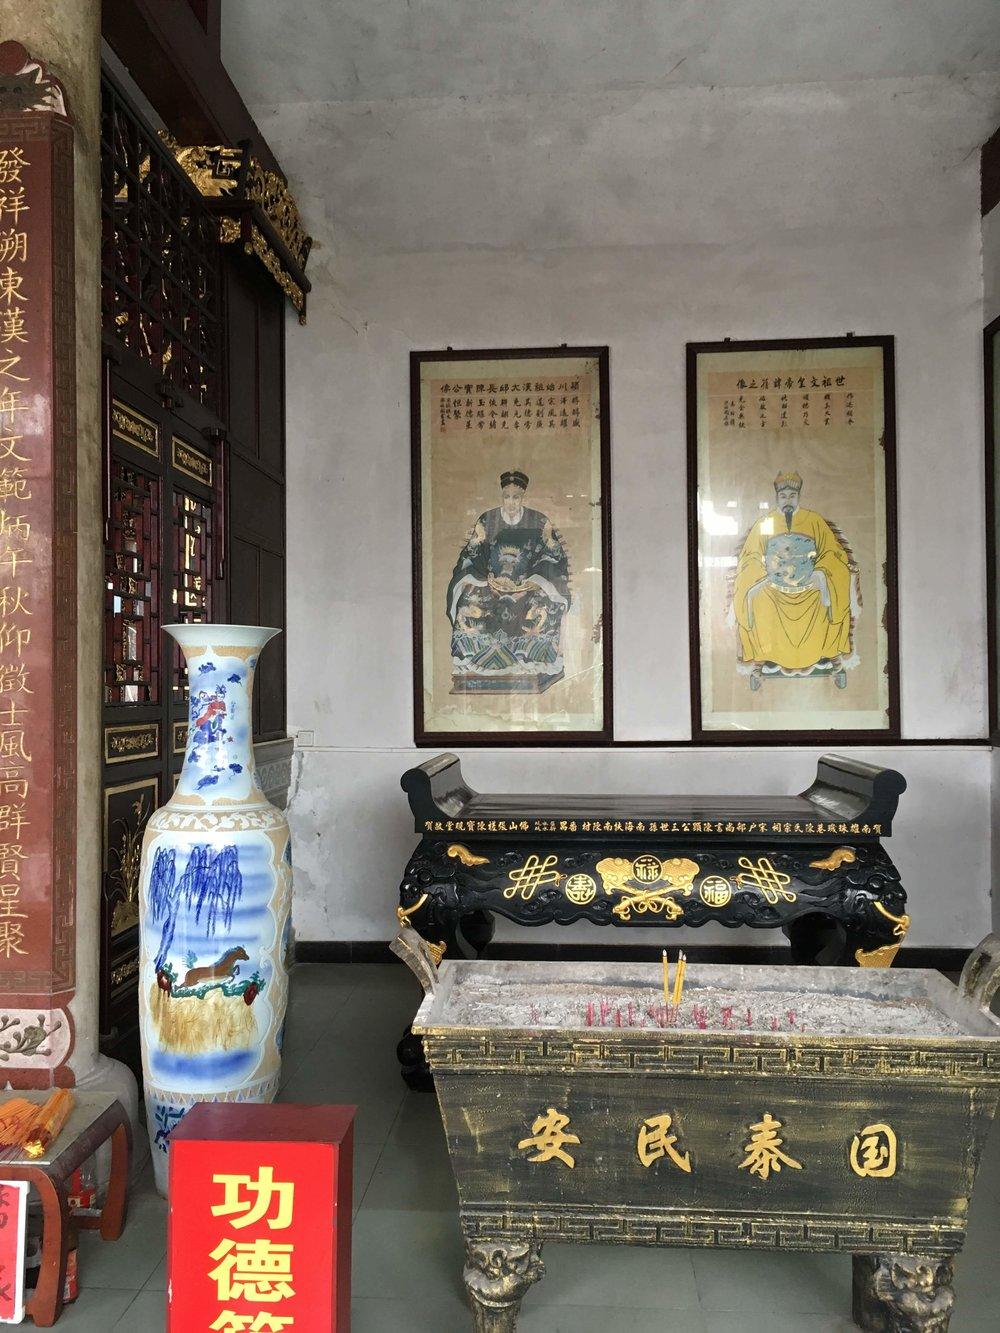 Portraits of ancestors in the shrine